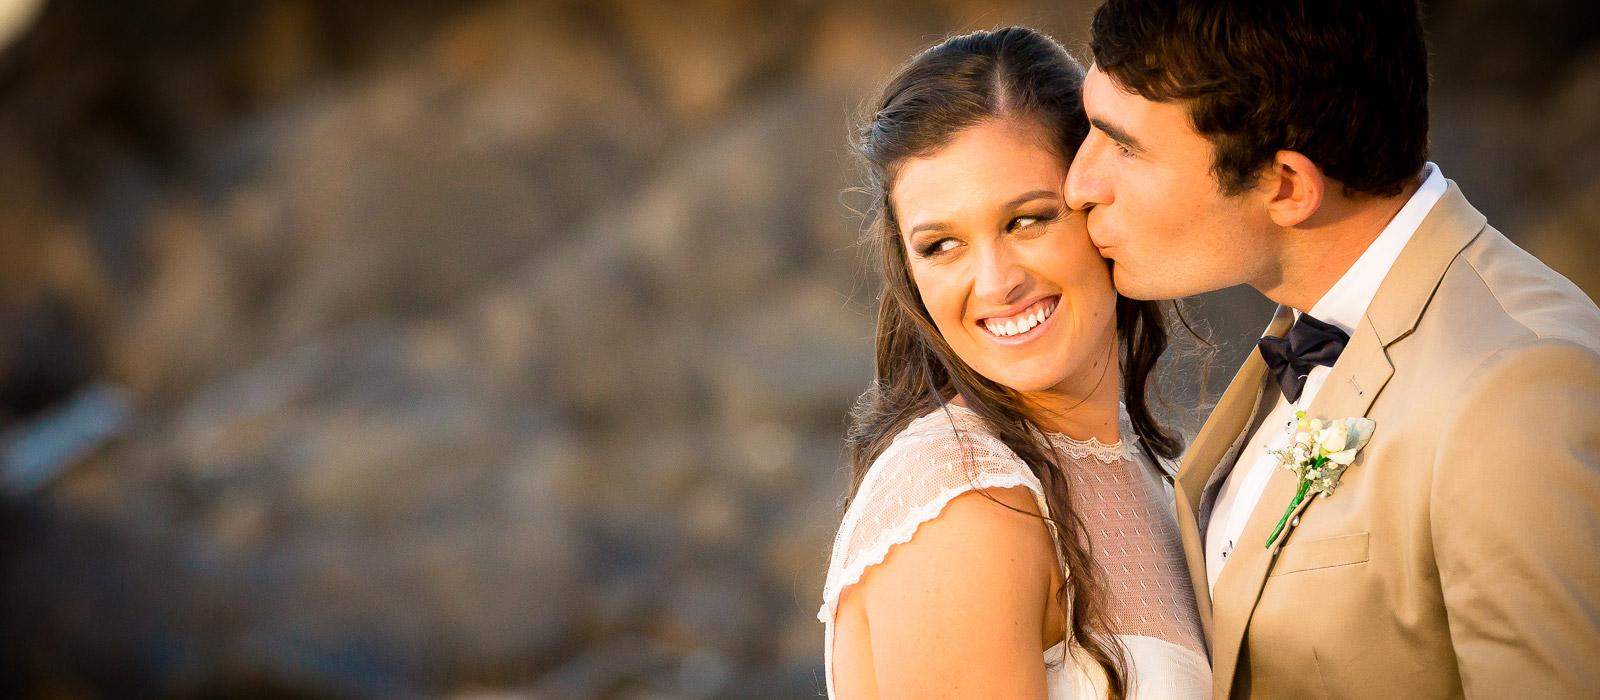 Bride and groom portrait at Cabarita Beach by Gold Coast wedding photographer Chris Harding